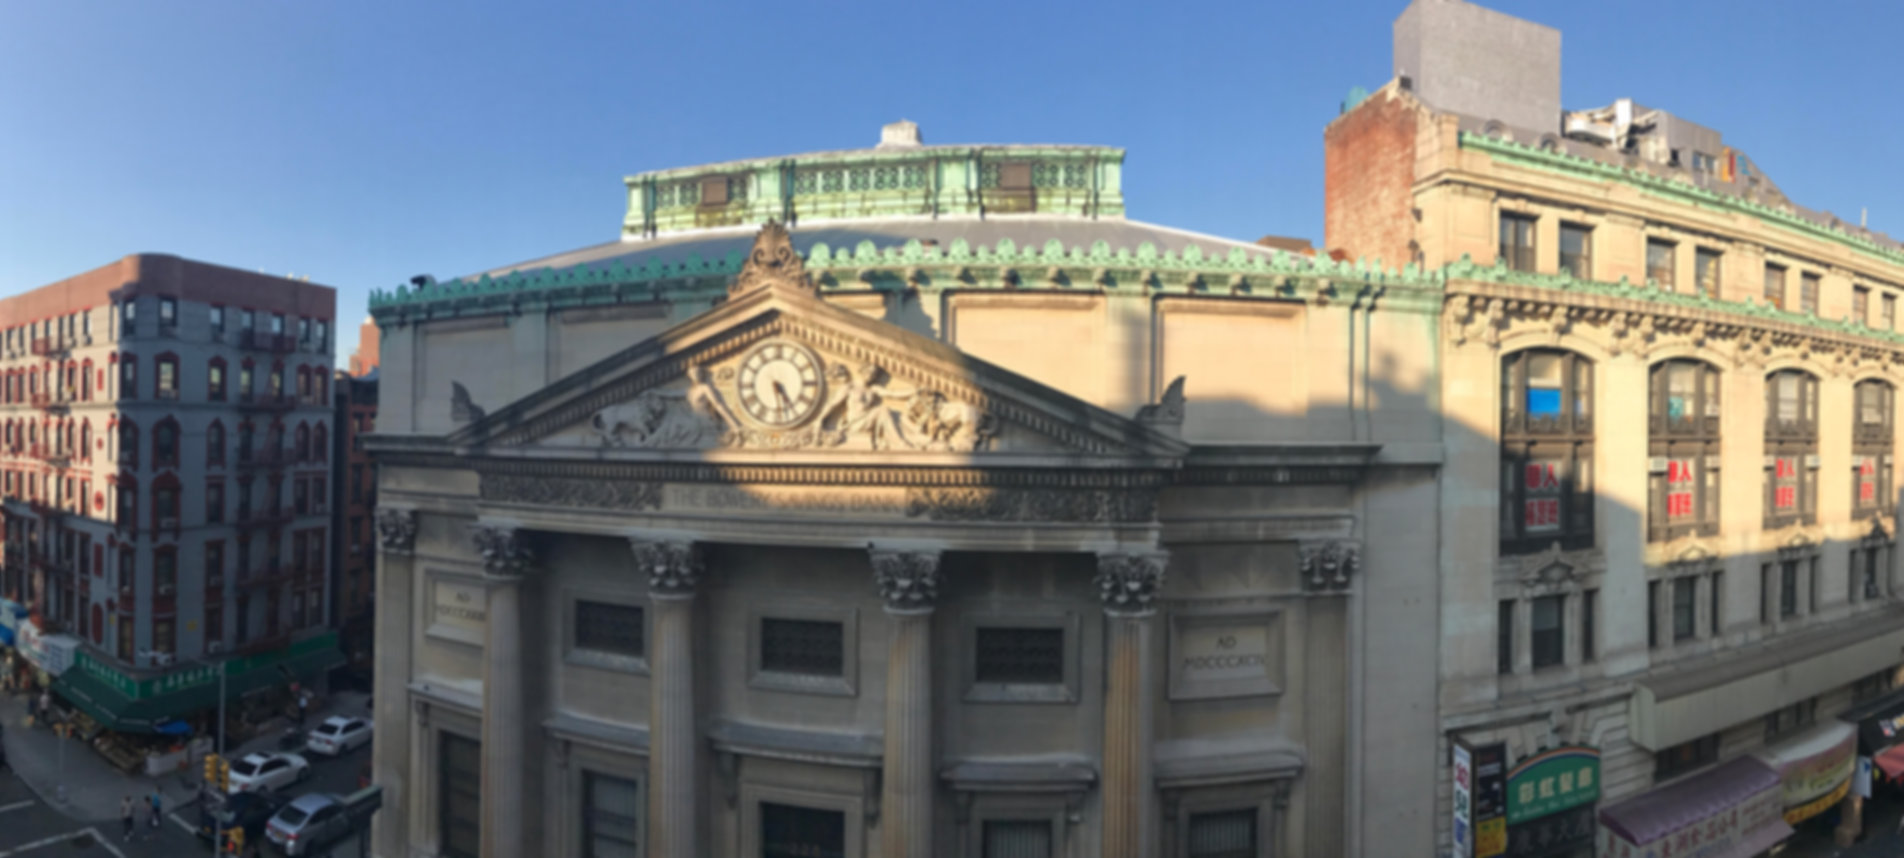 Bowery Savings Bank.jpg